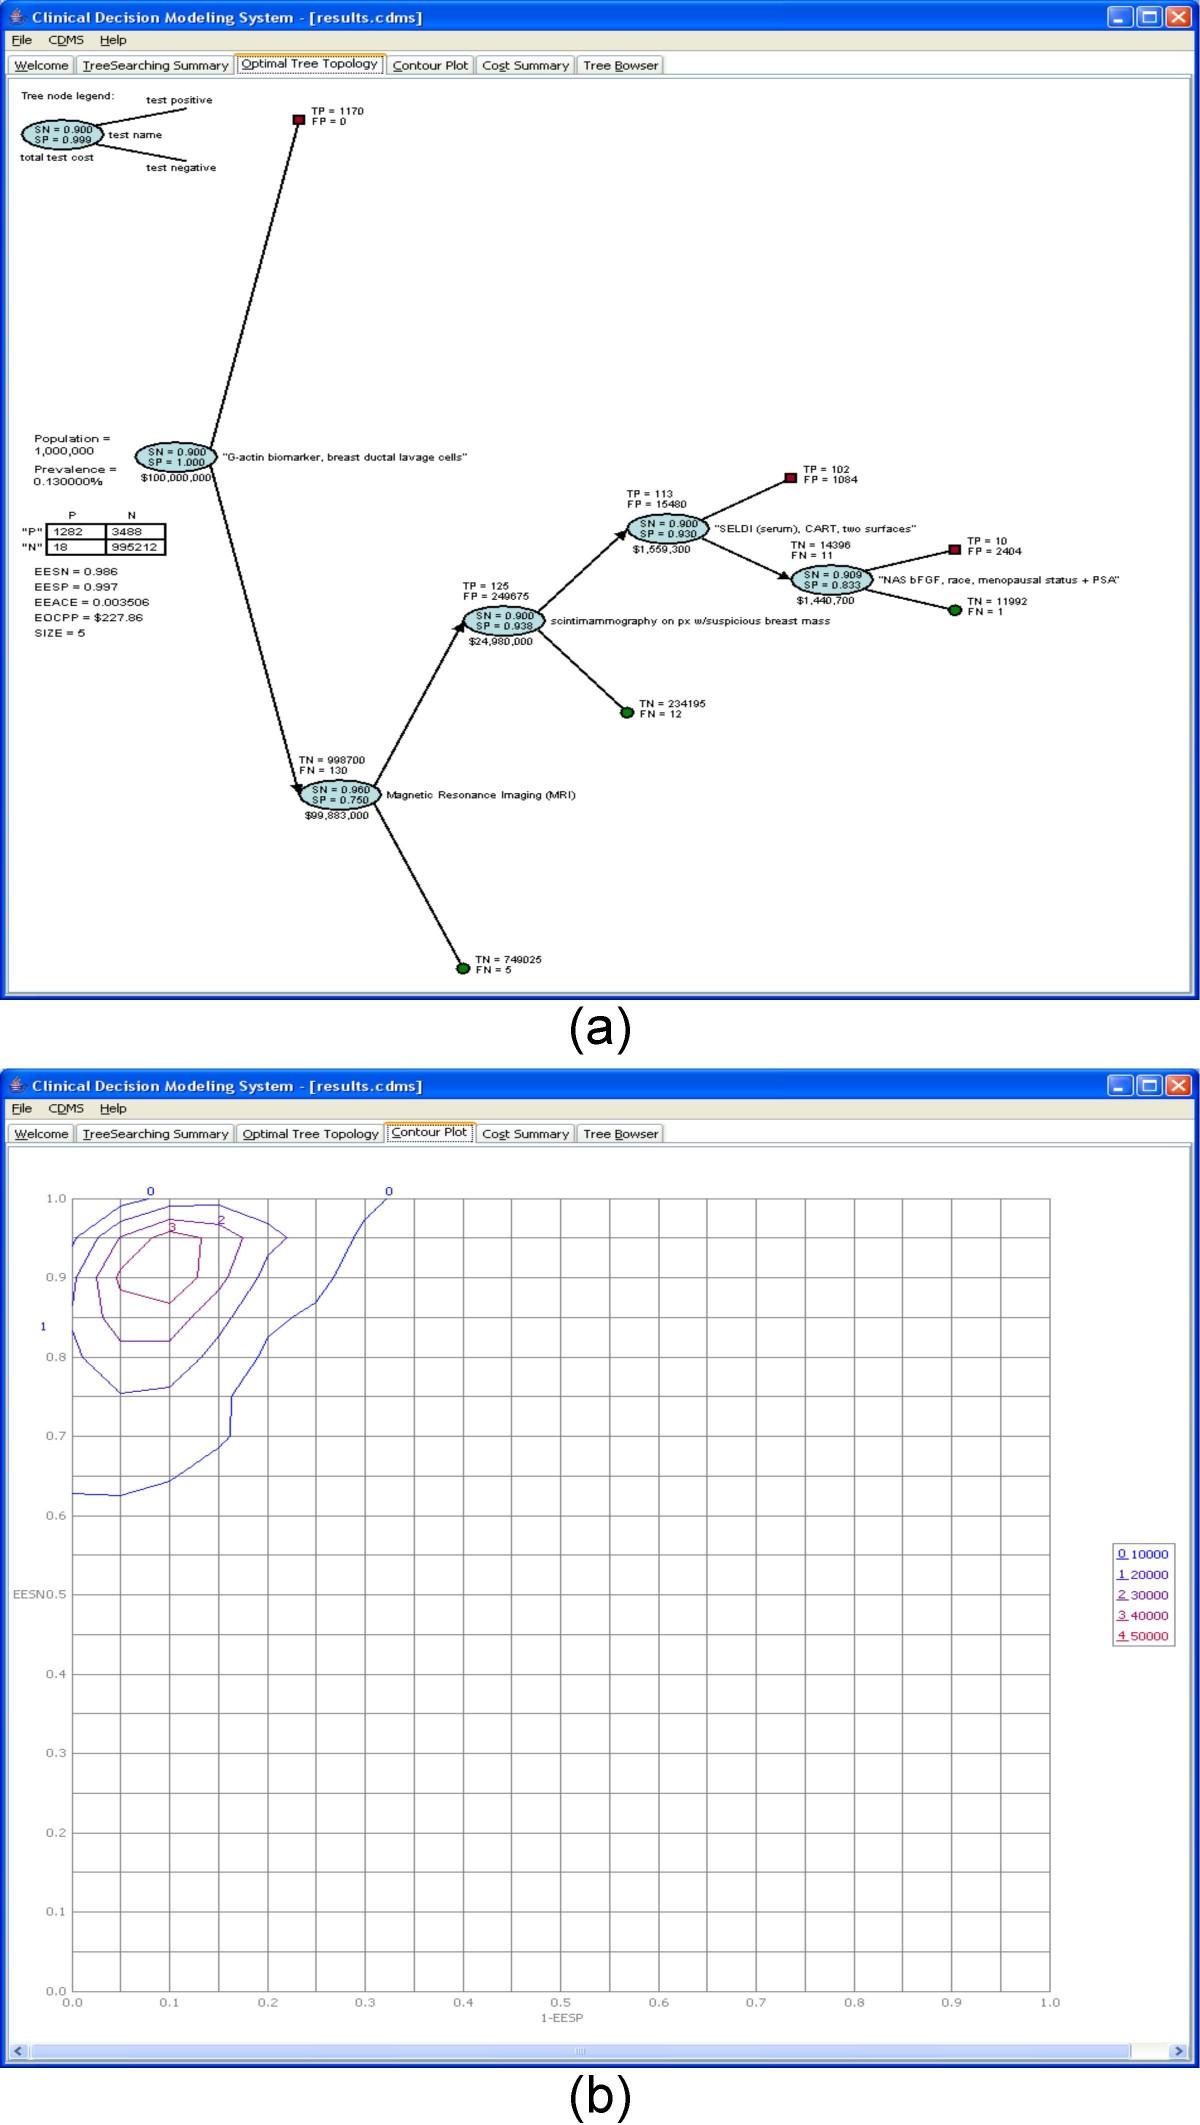 Clinical Decision Modeling System Bmc Medical Informatics And File Name Functionblockdiagramtutorialpptzip Figure 4